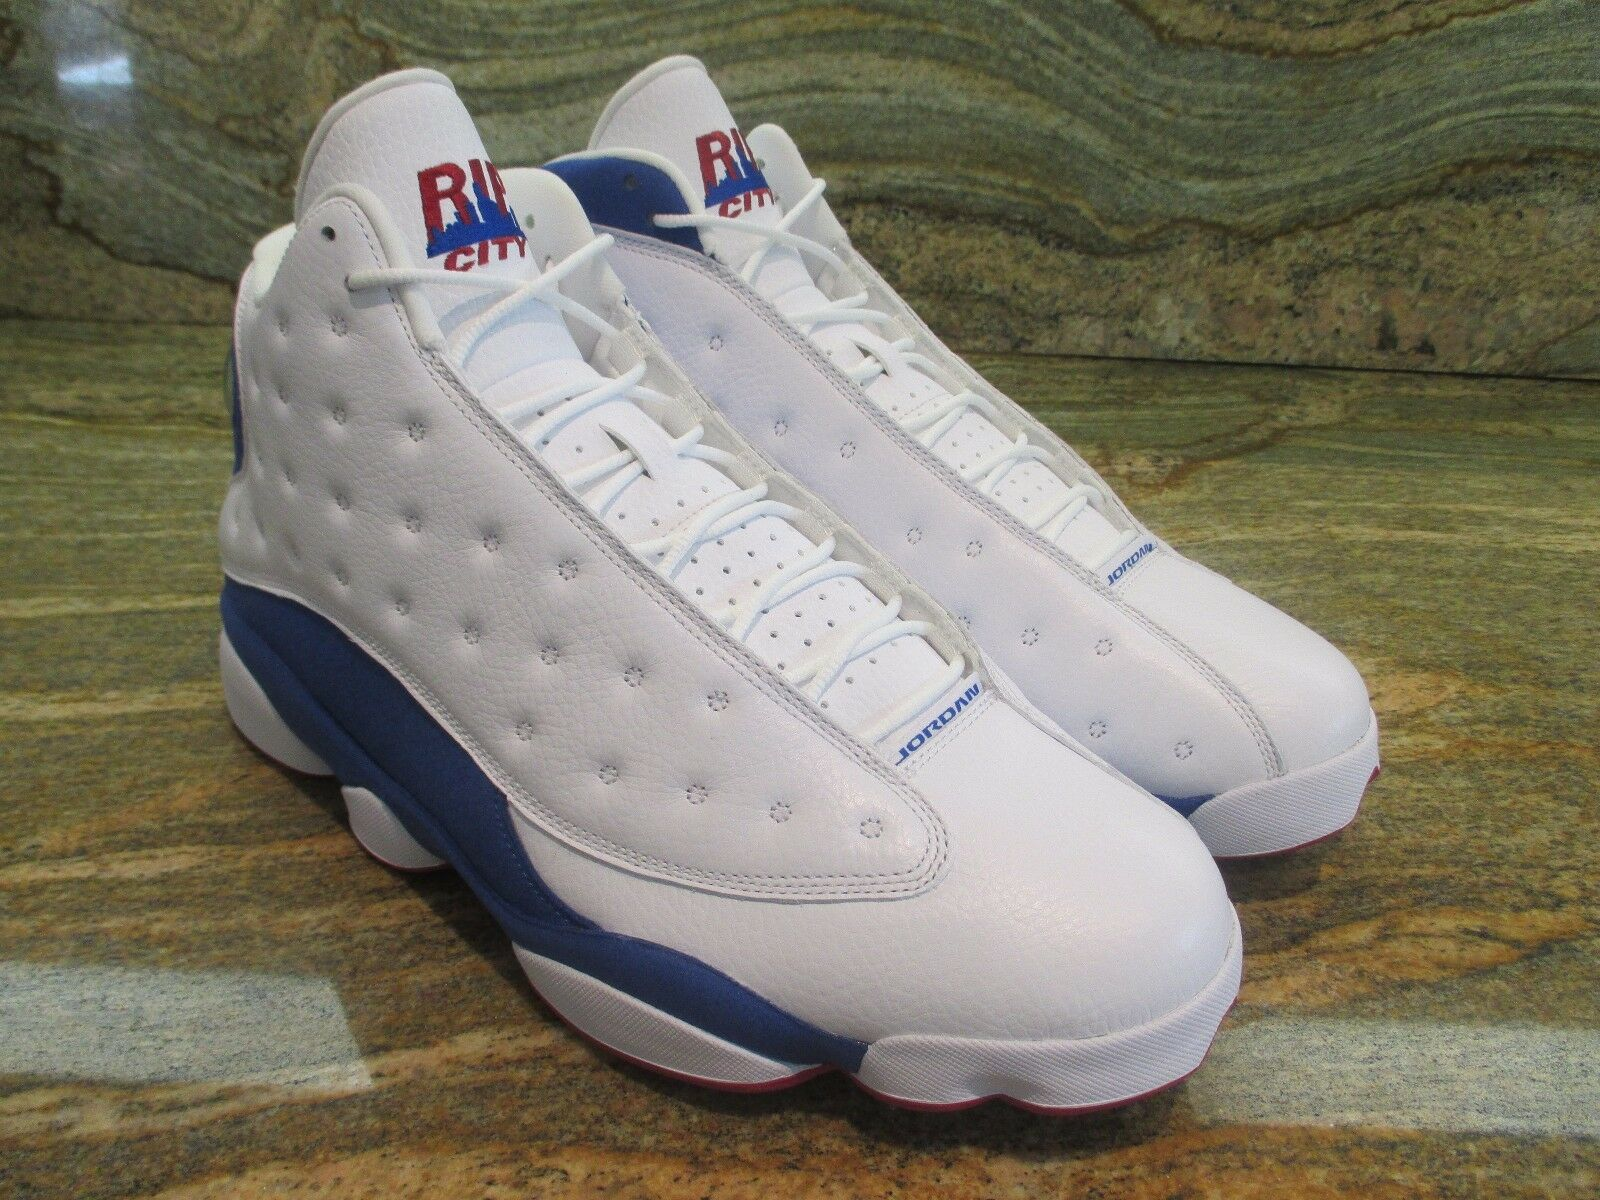 Unreleased Nike Air Jordan 13 Retro Promo Sample SZ 14 Richard RIP Hamilton PE